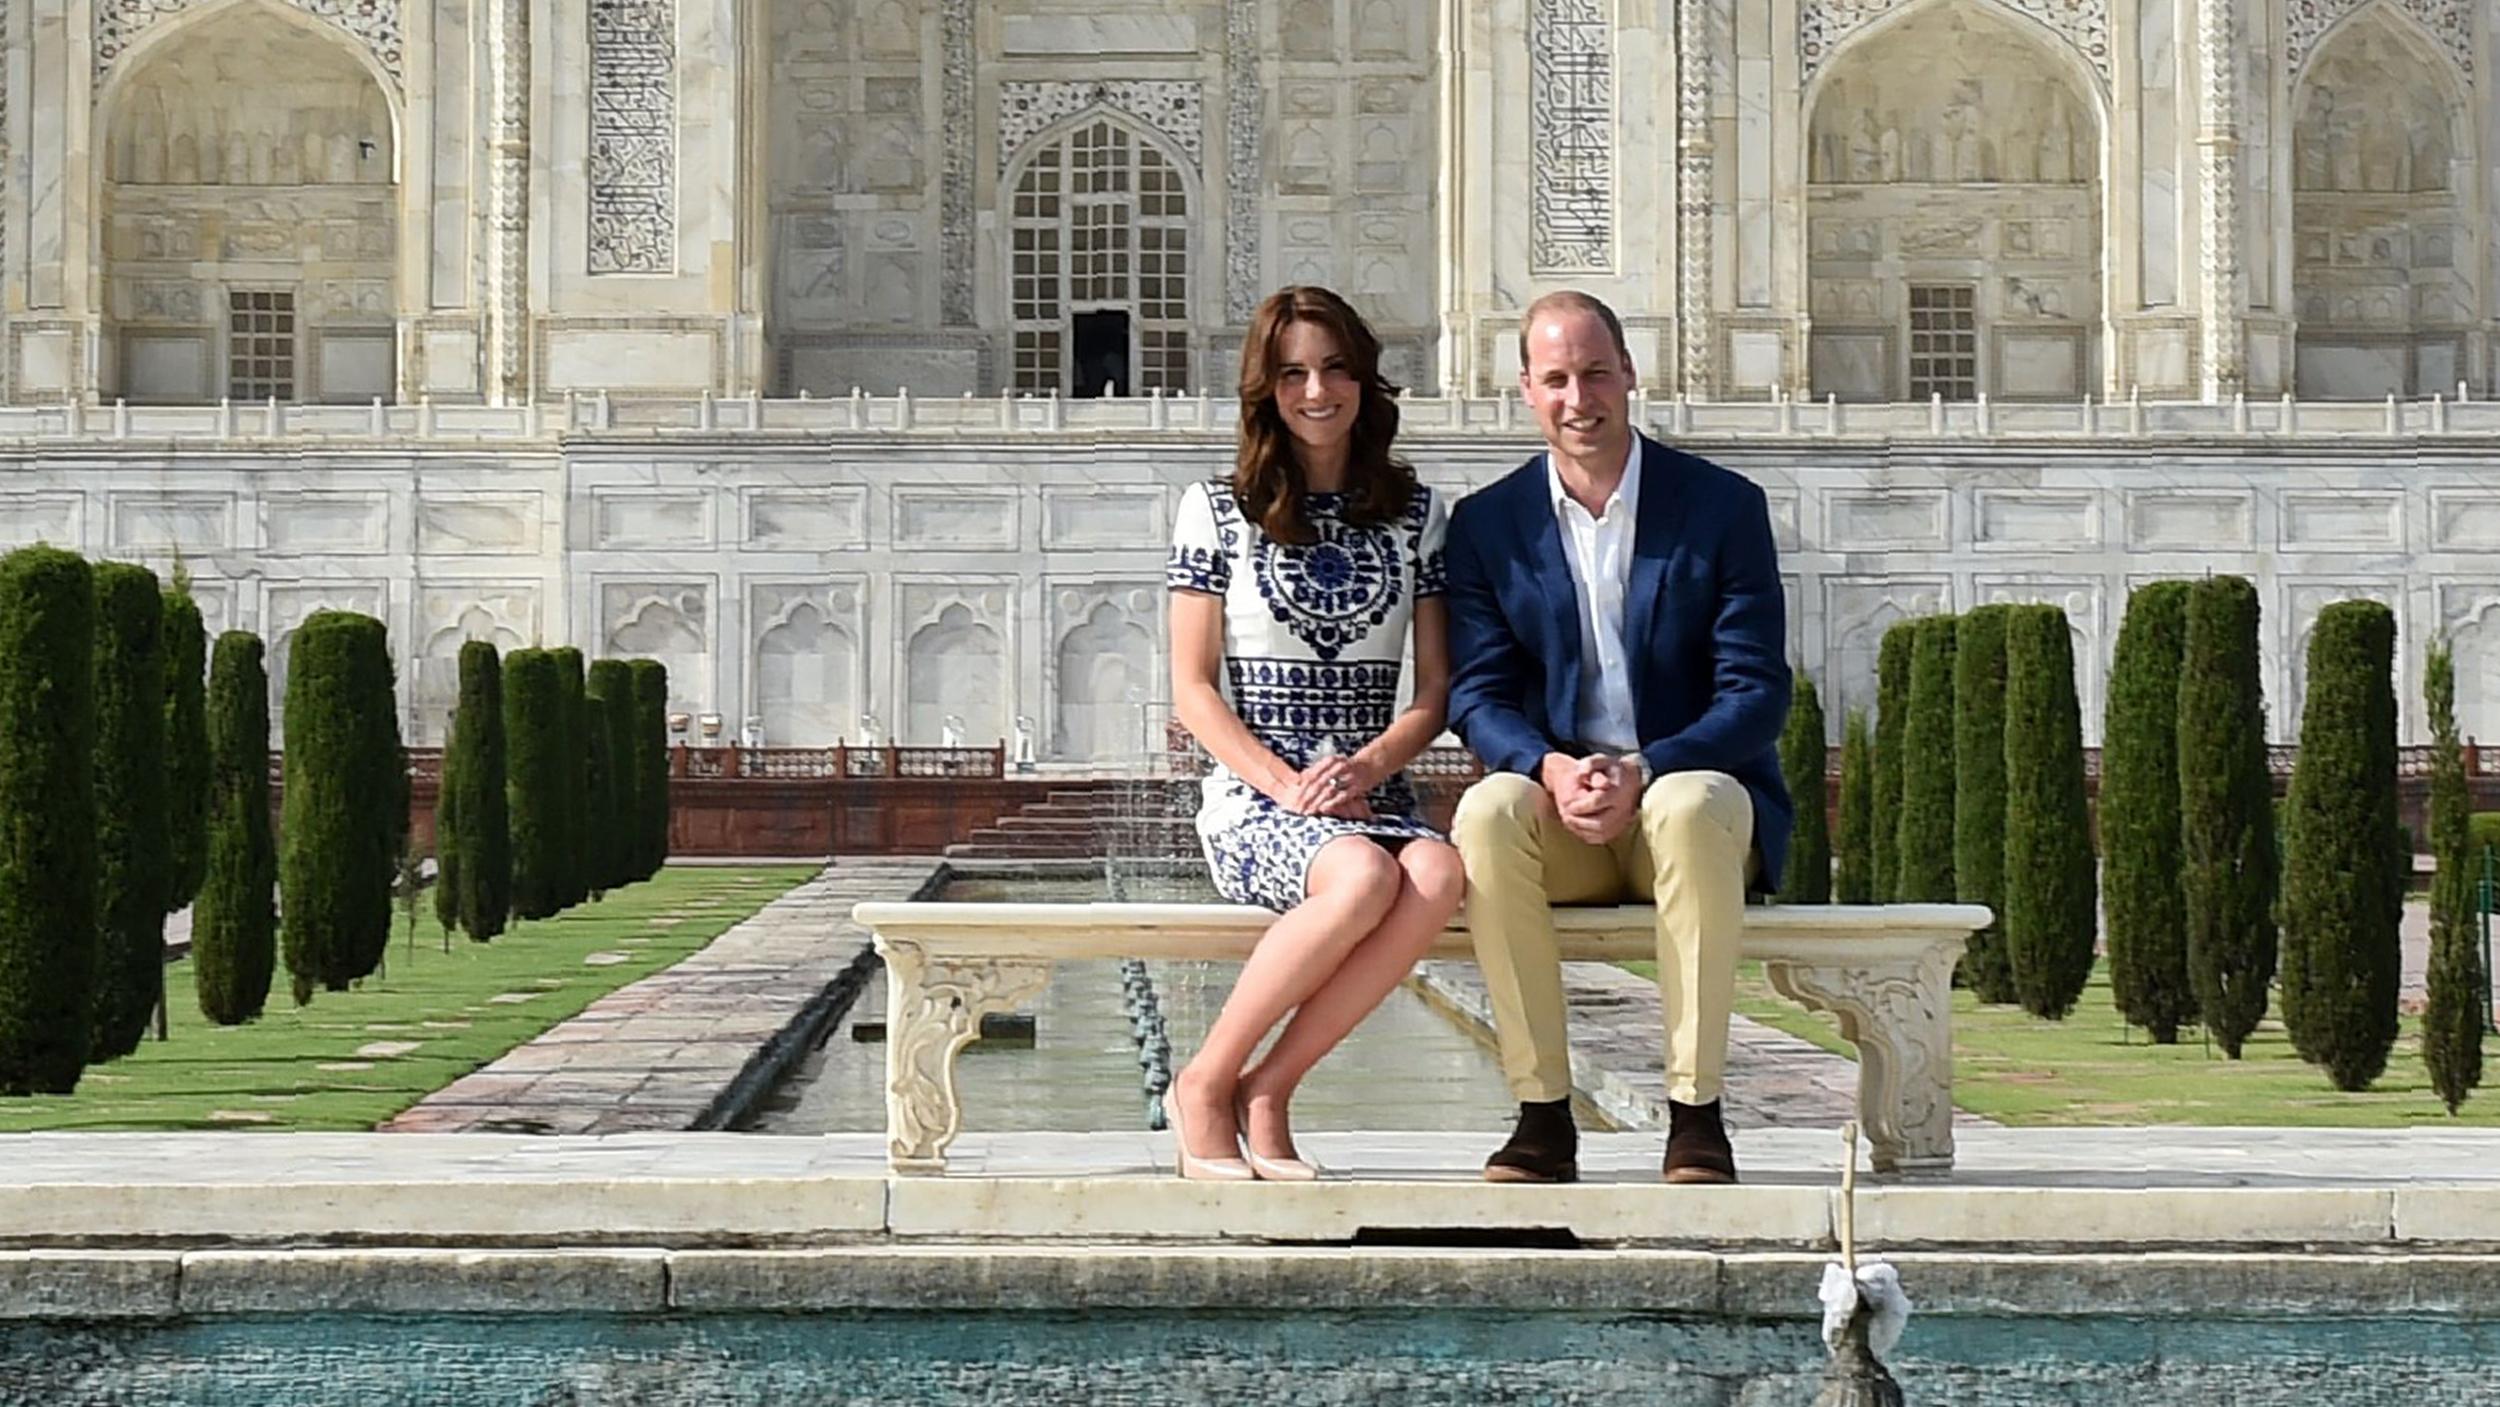 Prince William Duchess Kate Visit The Taj Mahal Sit On